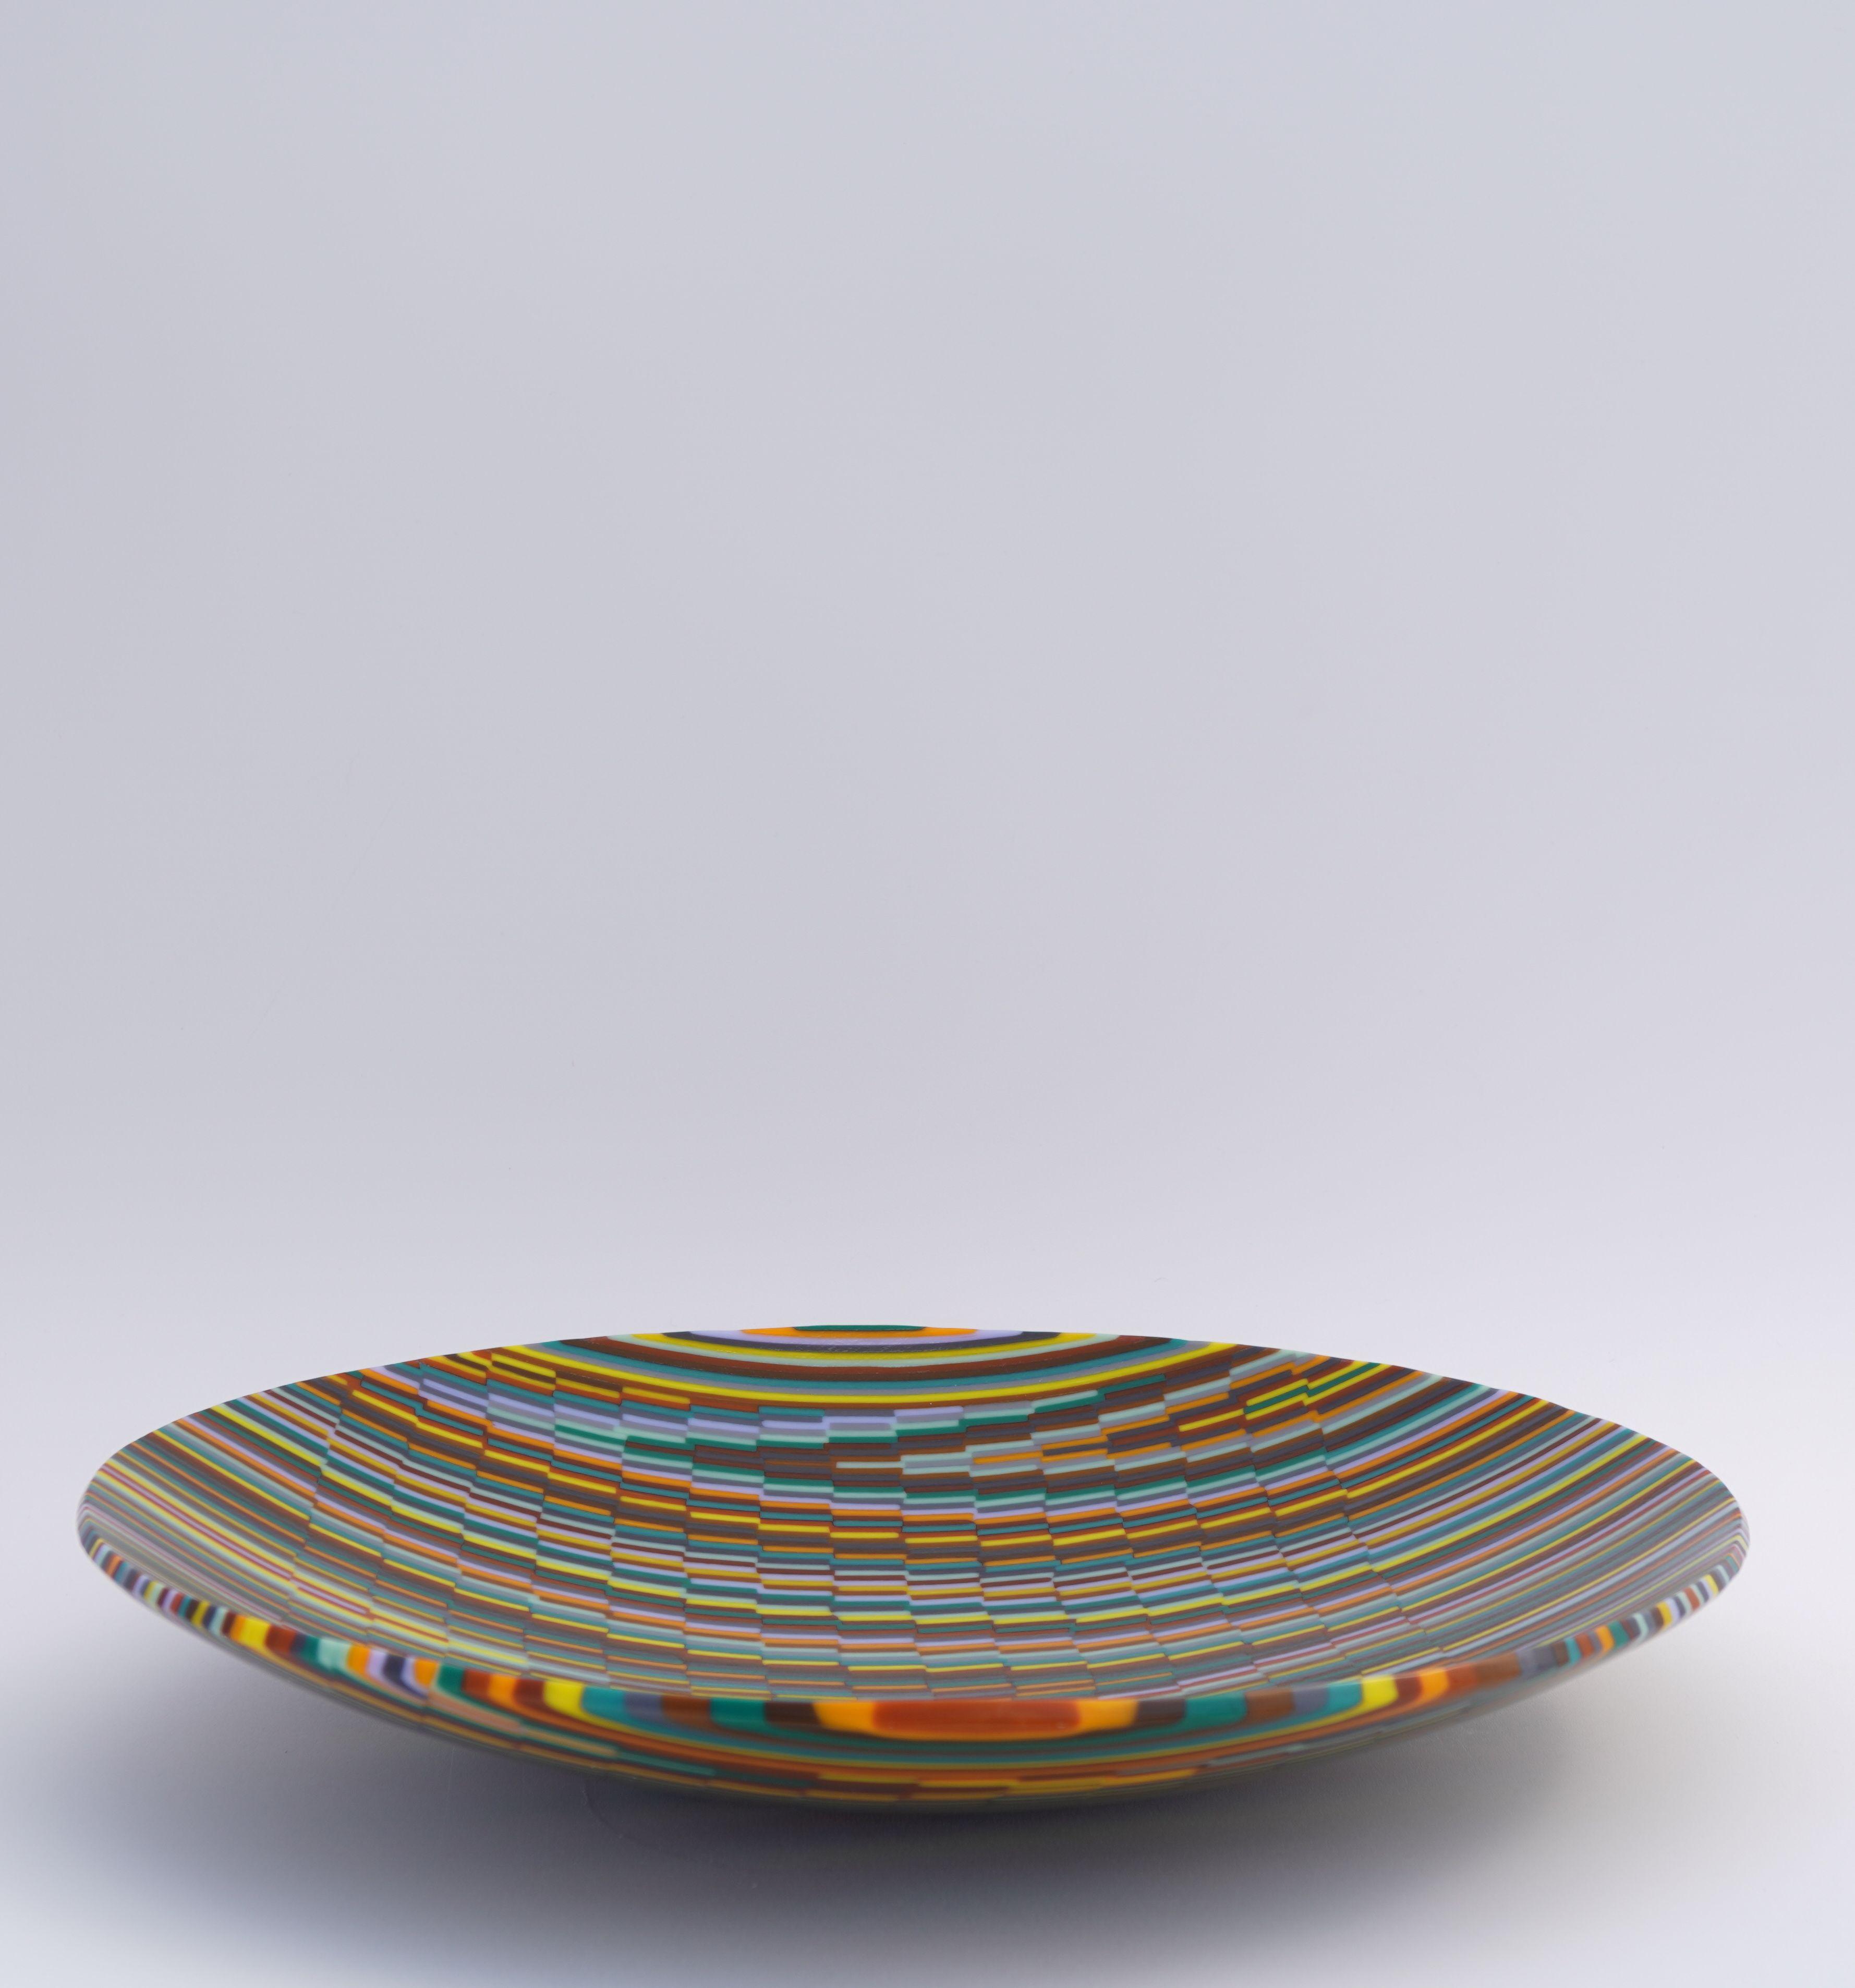 Fused Glass Decorative Bowl In 2020 Decorative Bowls Glass Bowl Decor Fused Glass Bowl